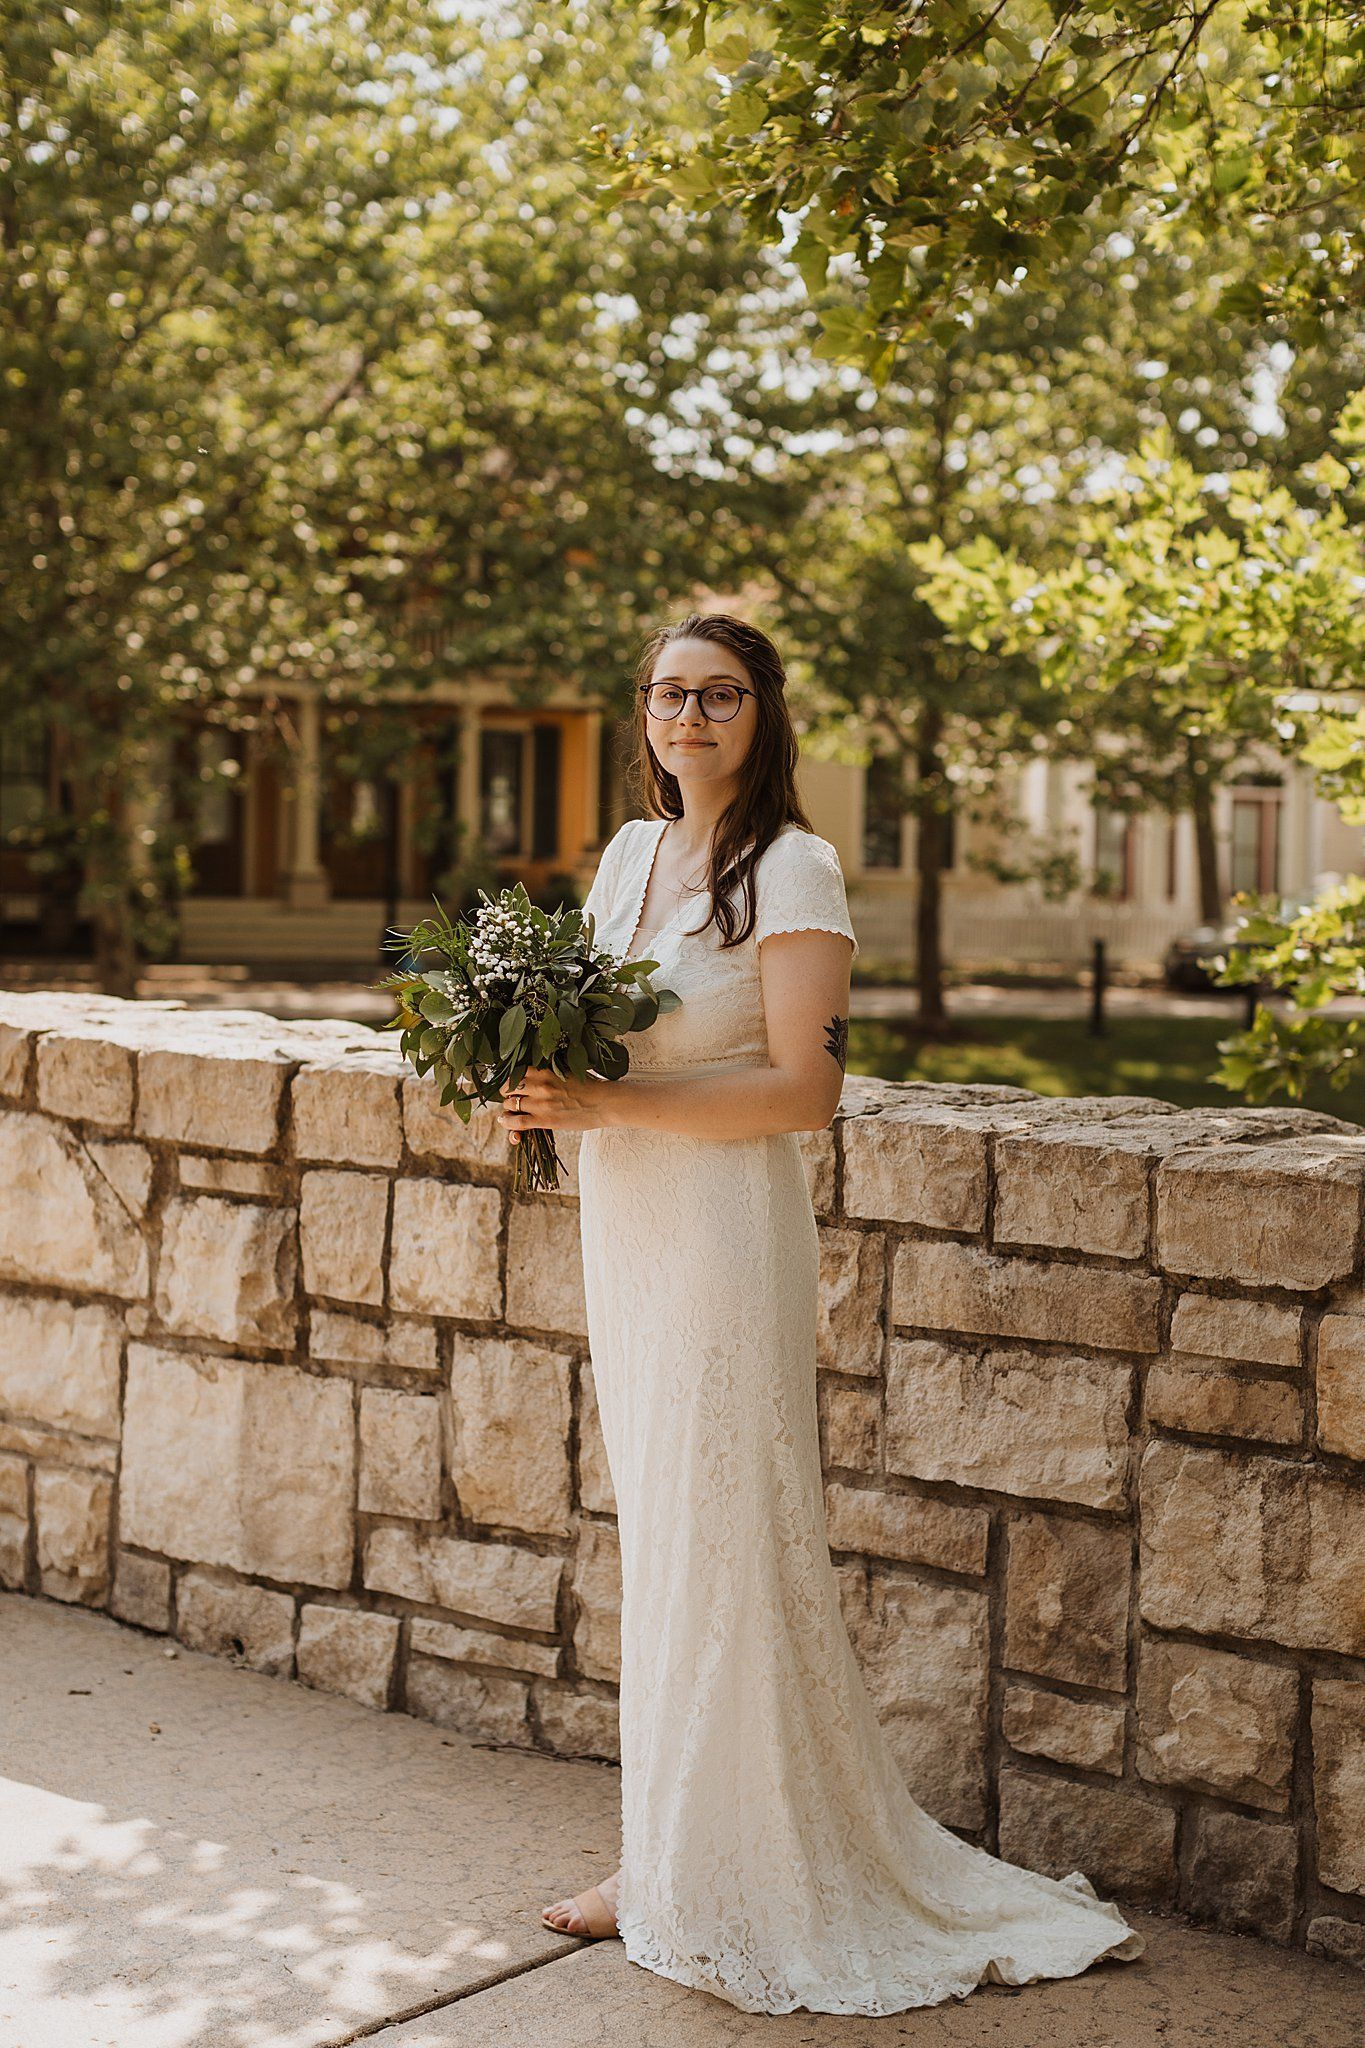 New Town Bride St Charles In 2020 Chapel Wedding Wedding Dresses Sheath Wedding Dress